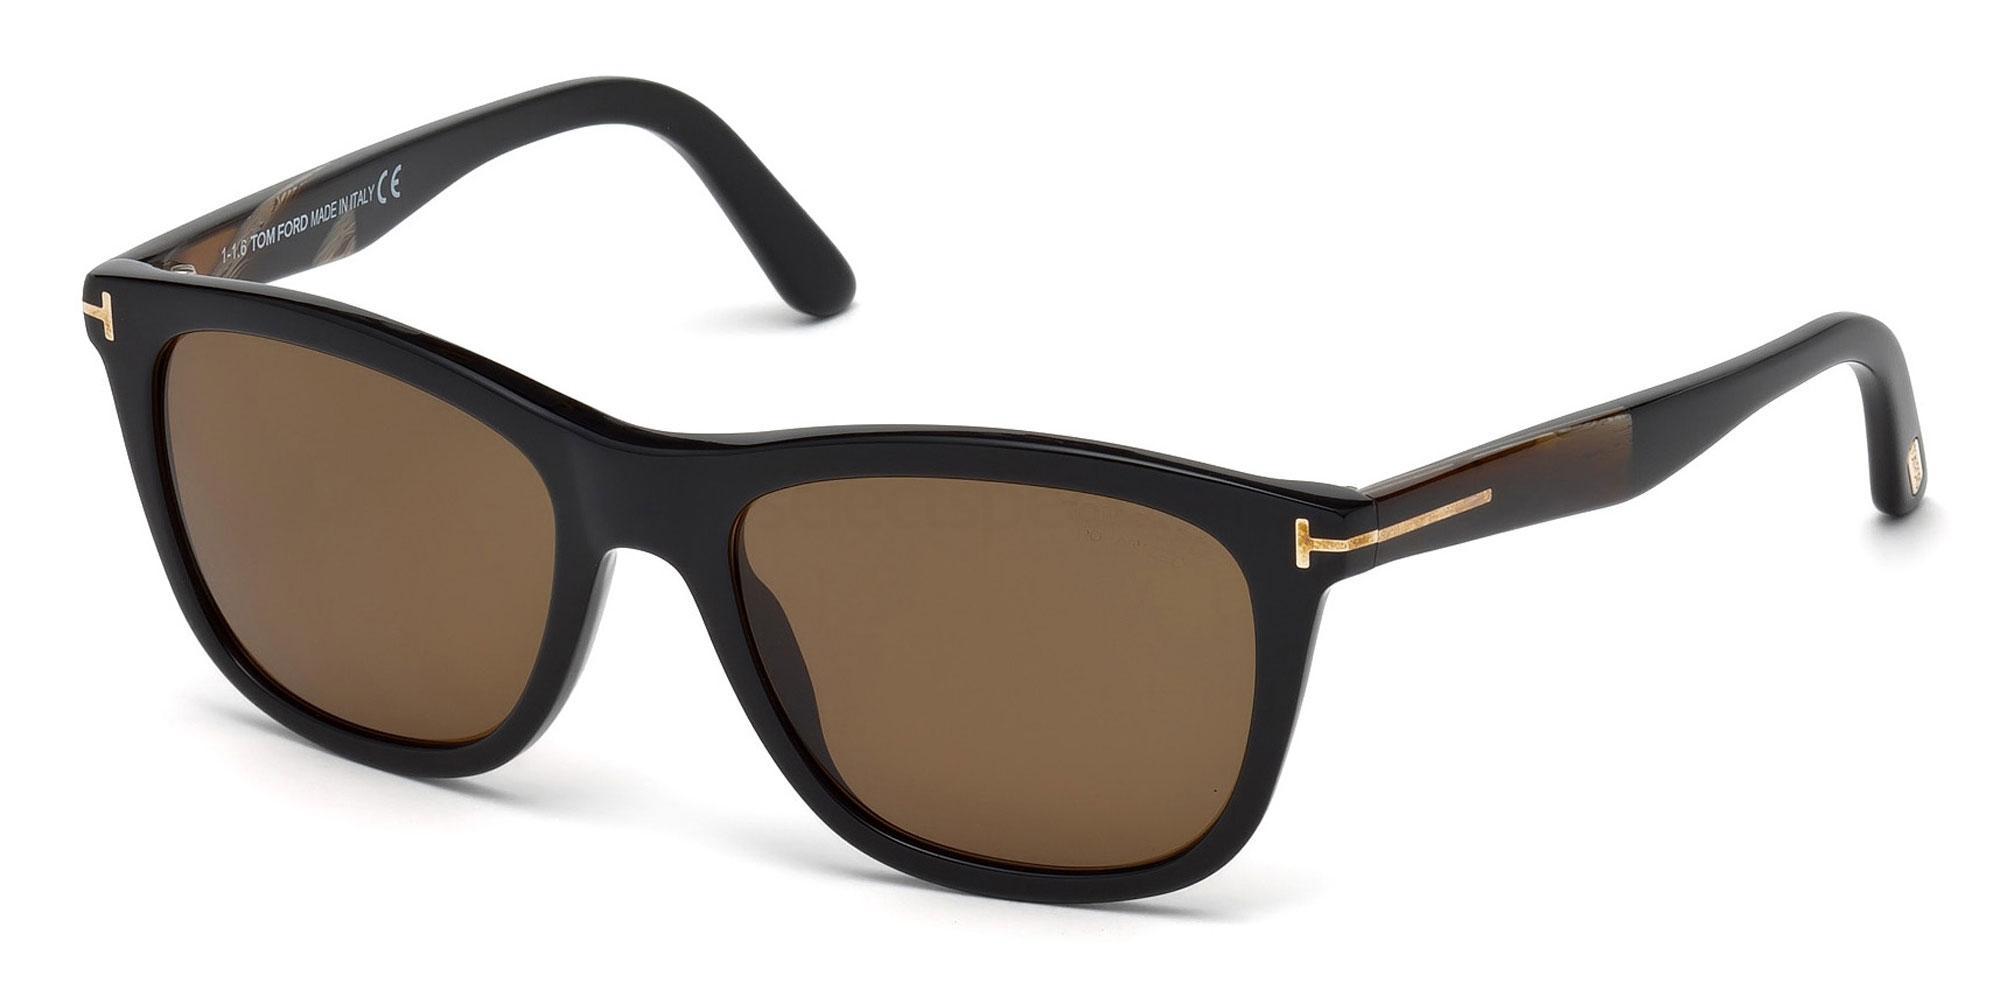 01H FT0500 Sunglasses, Tom Ford